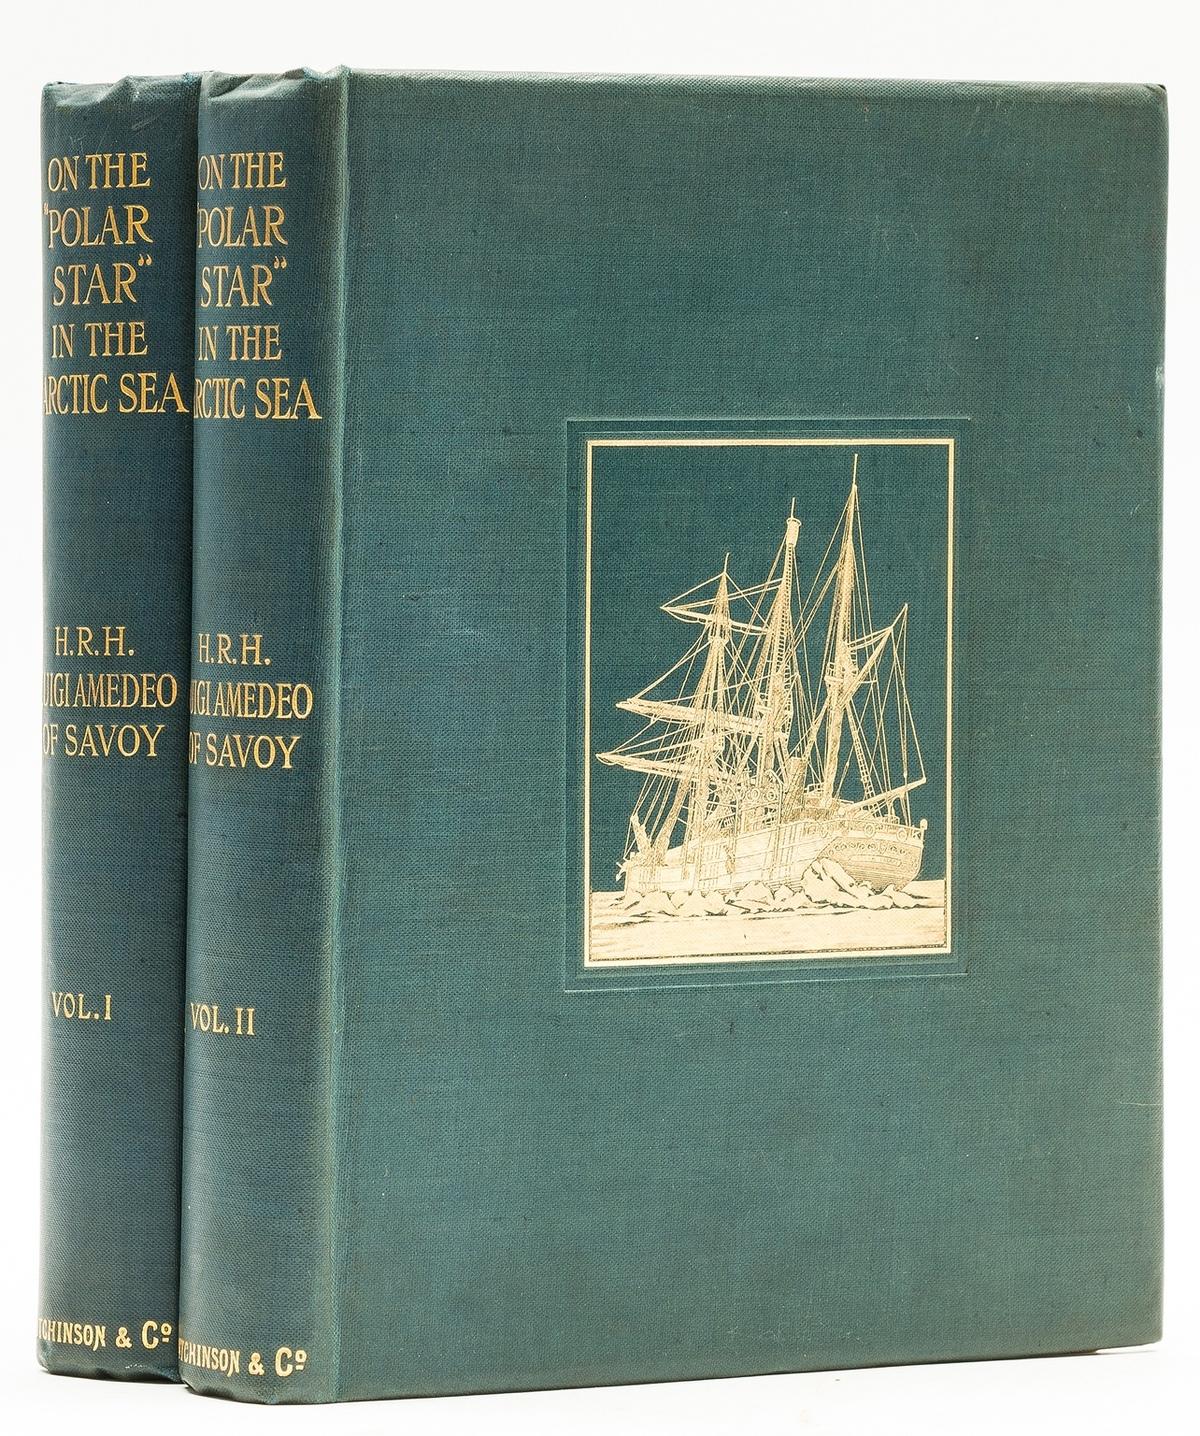 "Polar.- Amedo of Savoy (Luigi) On the ""Polar Star"" in the Arctic Sea, 2 vol., first English …"